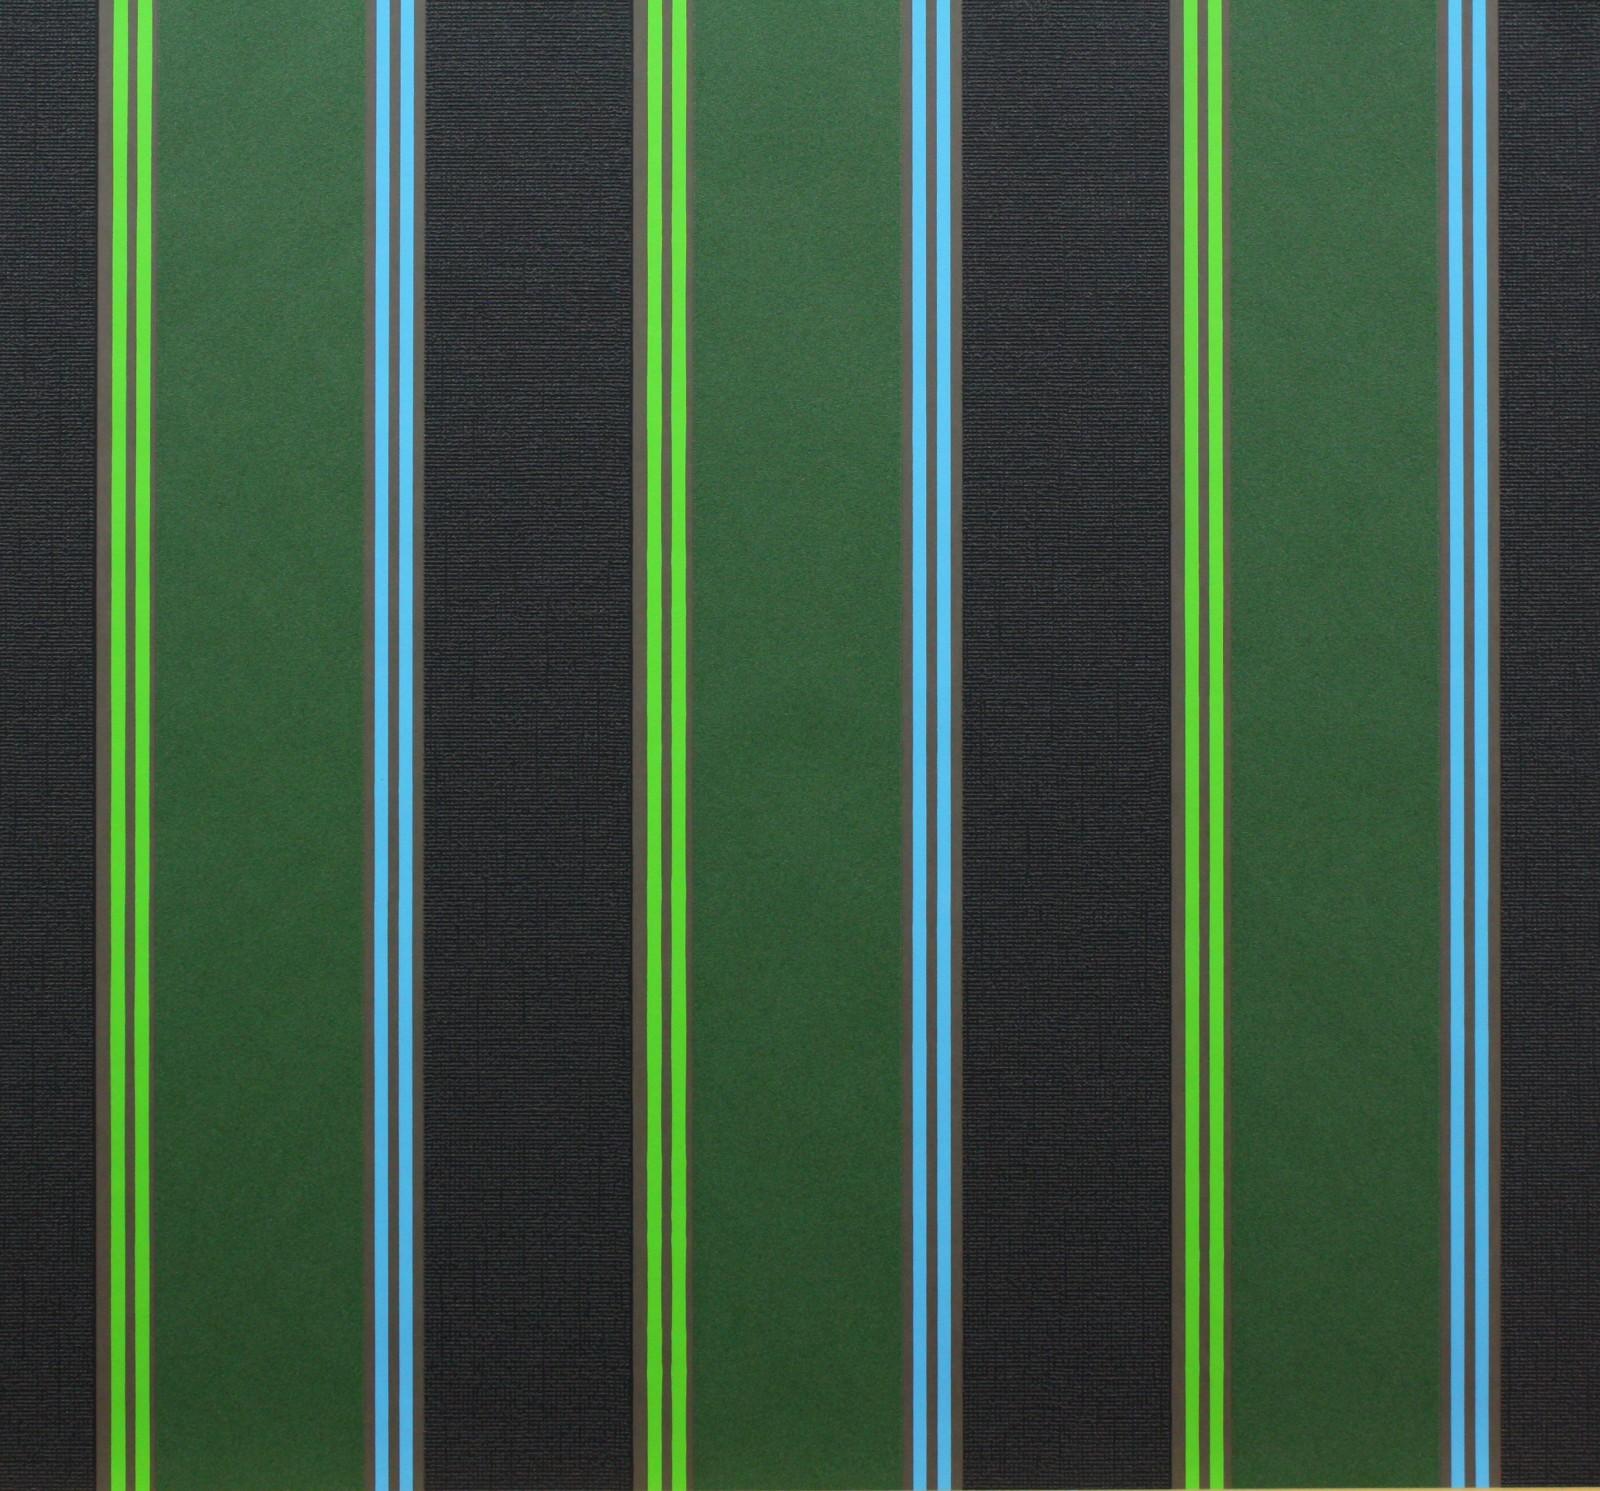 tapete panels marburg 51537 streifen gr n vliestapete 3. Black Bedroom Furniture Sets. Home Design Ideas